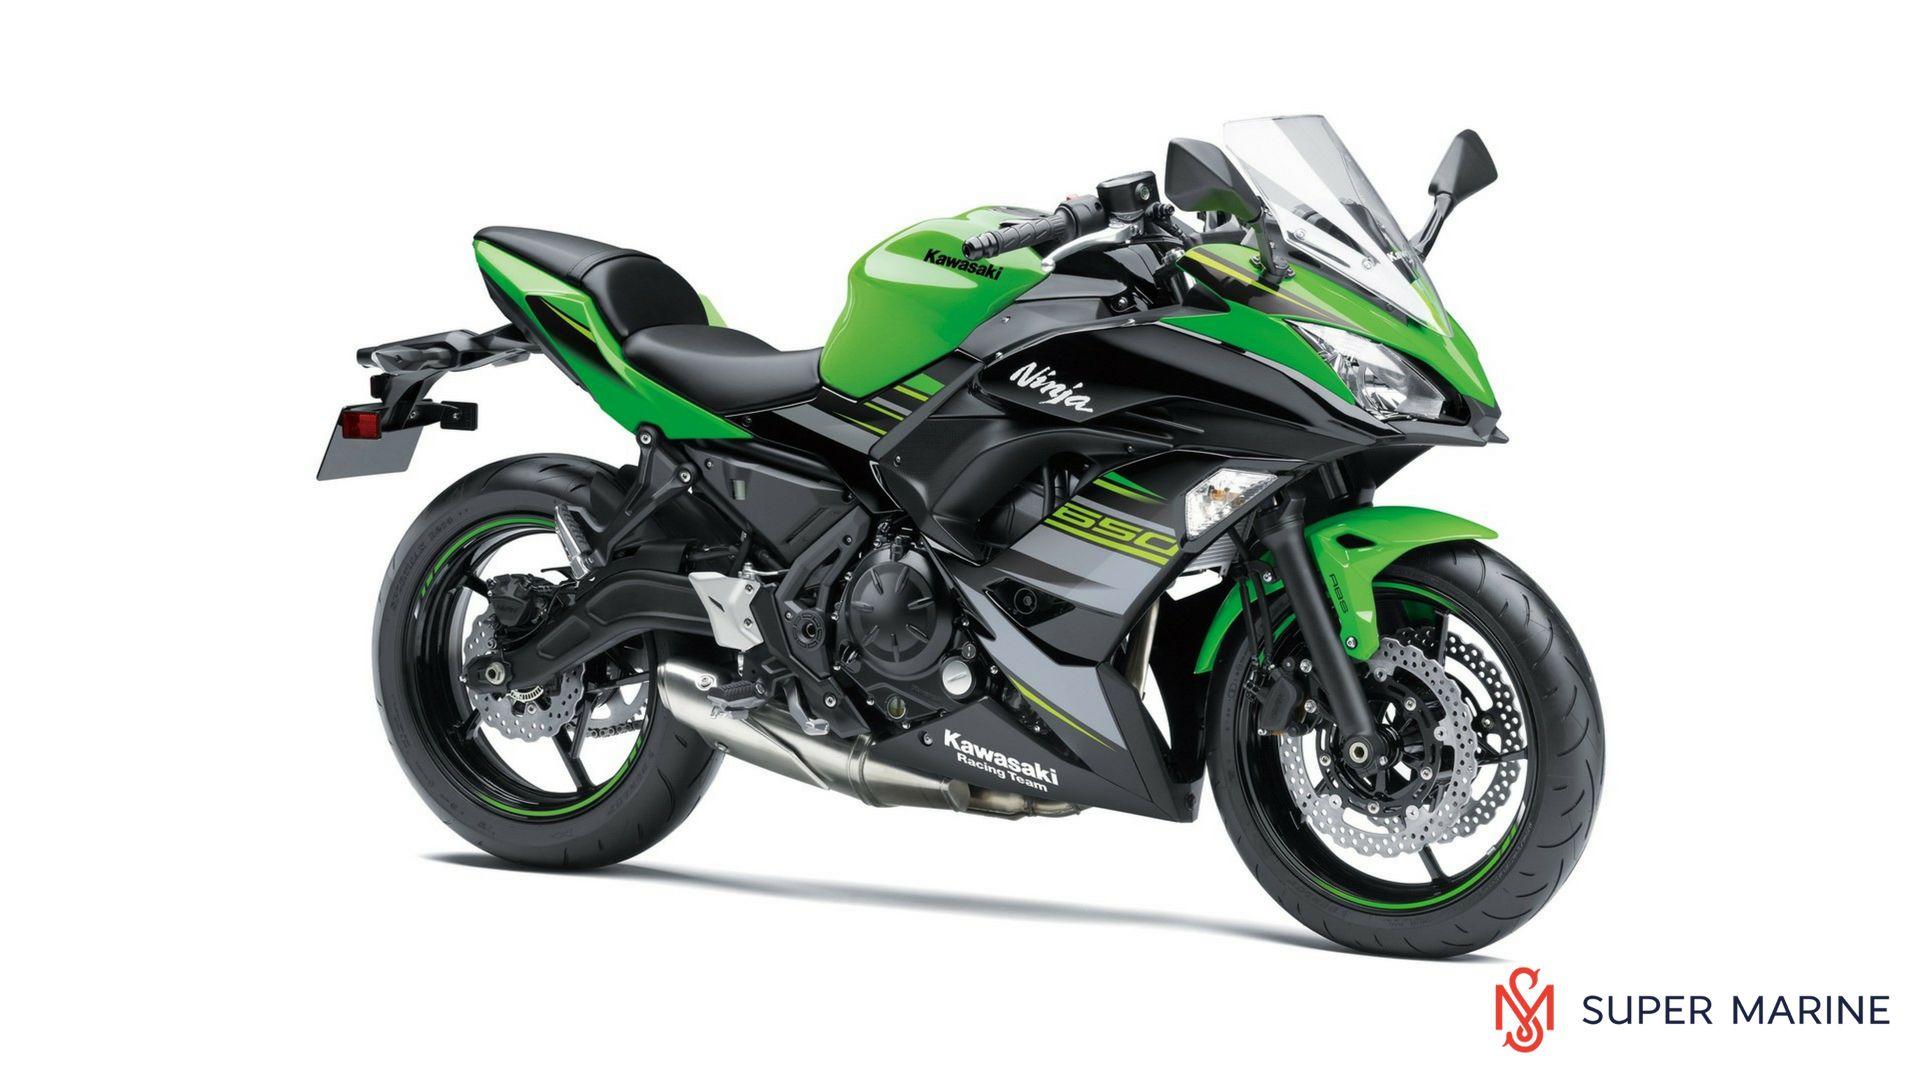 мотоцикл Kawasaki Ninja 650 Krt Edition Abs зеленый 2018 супер